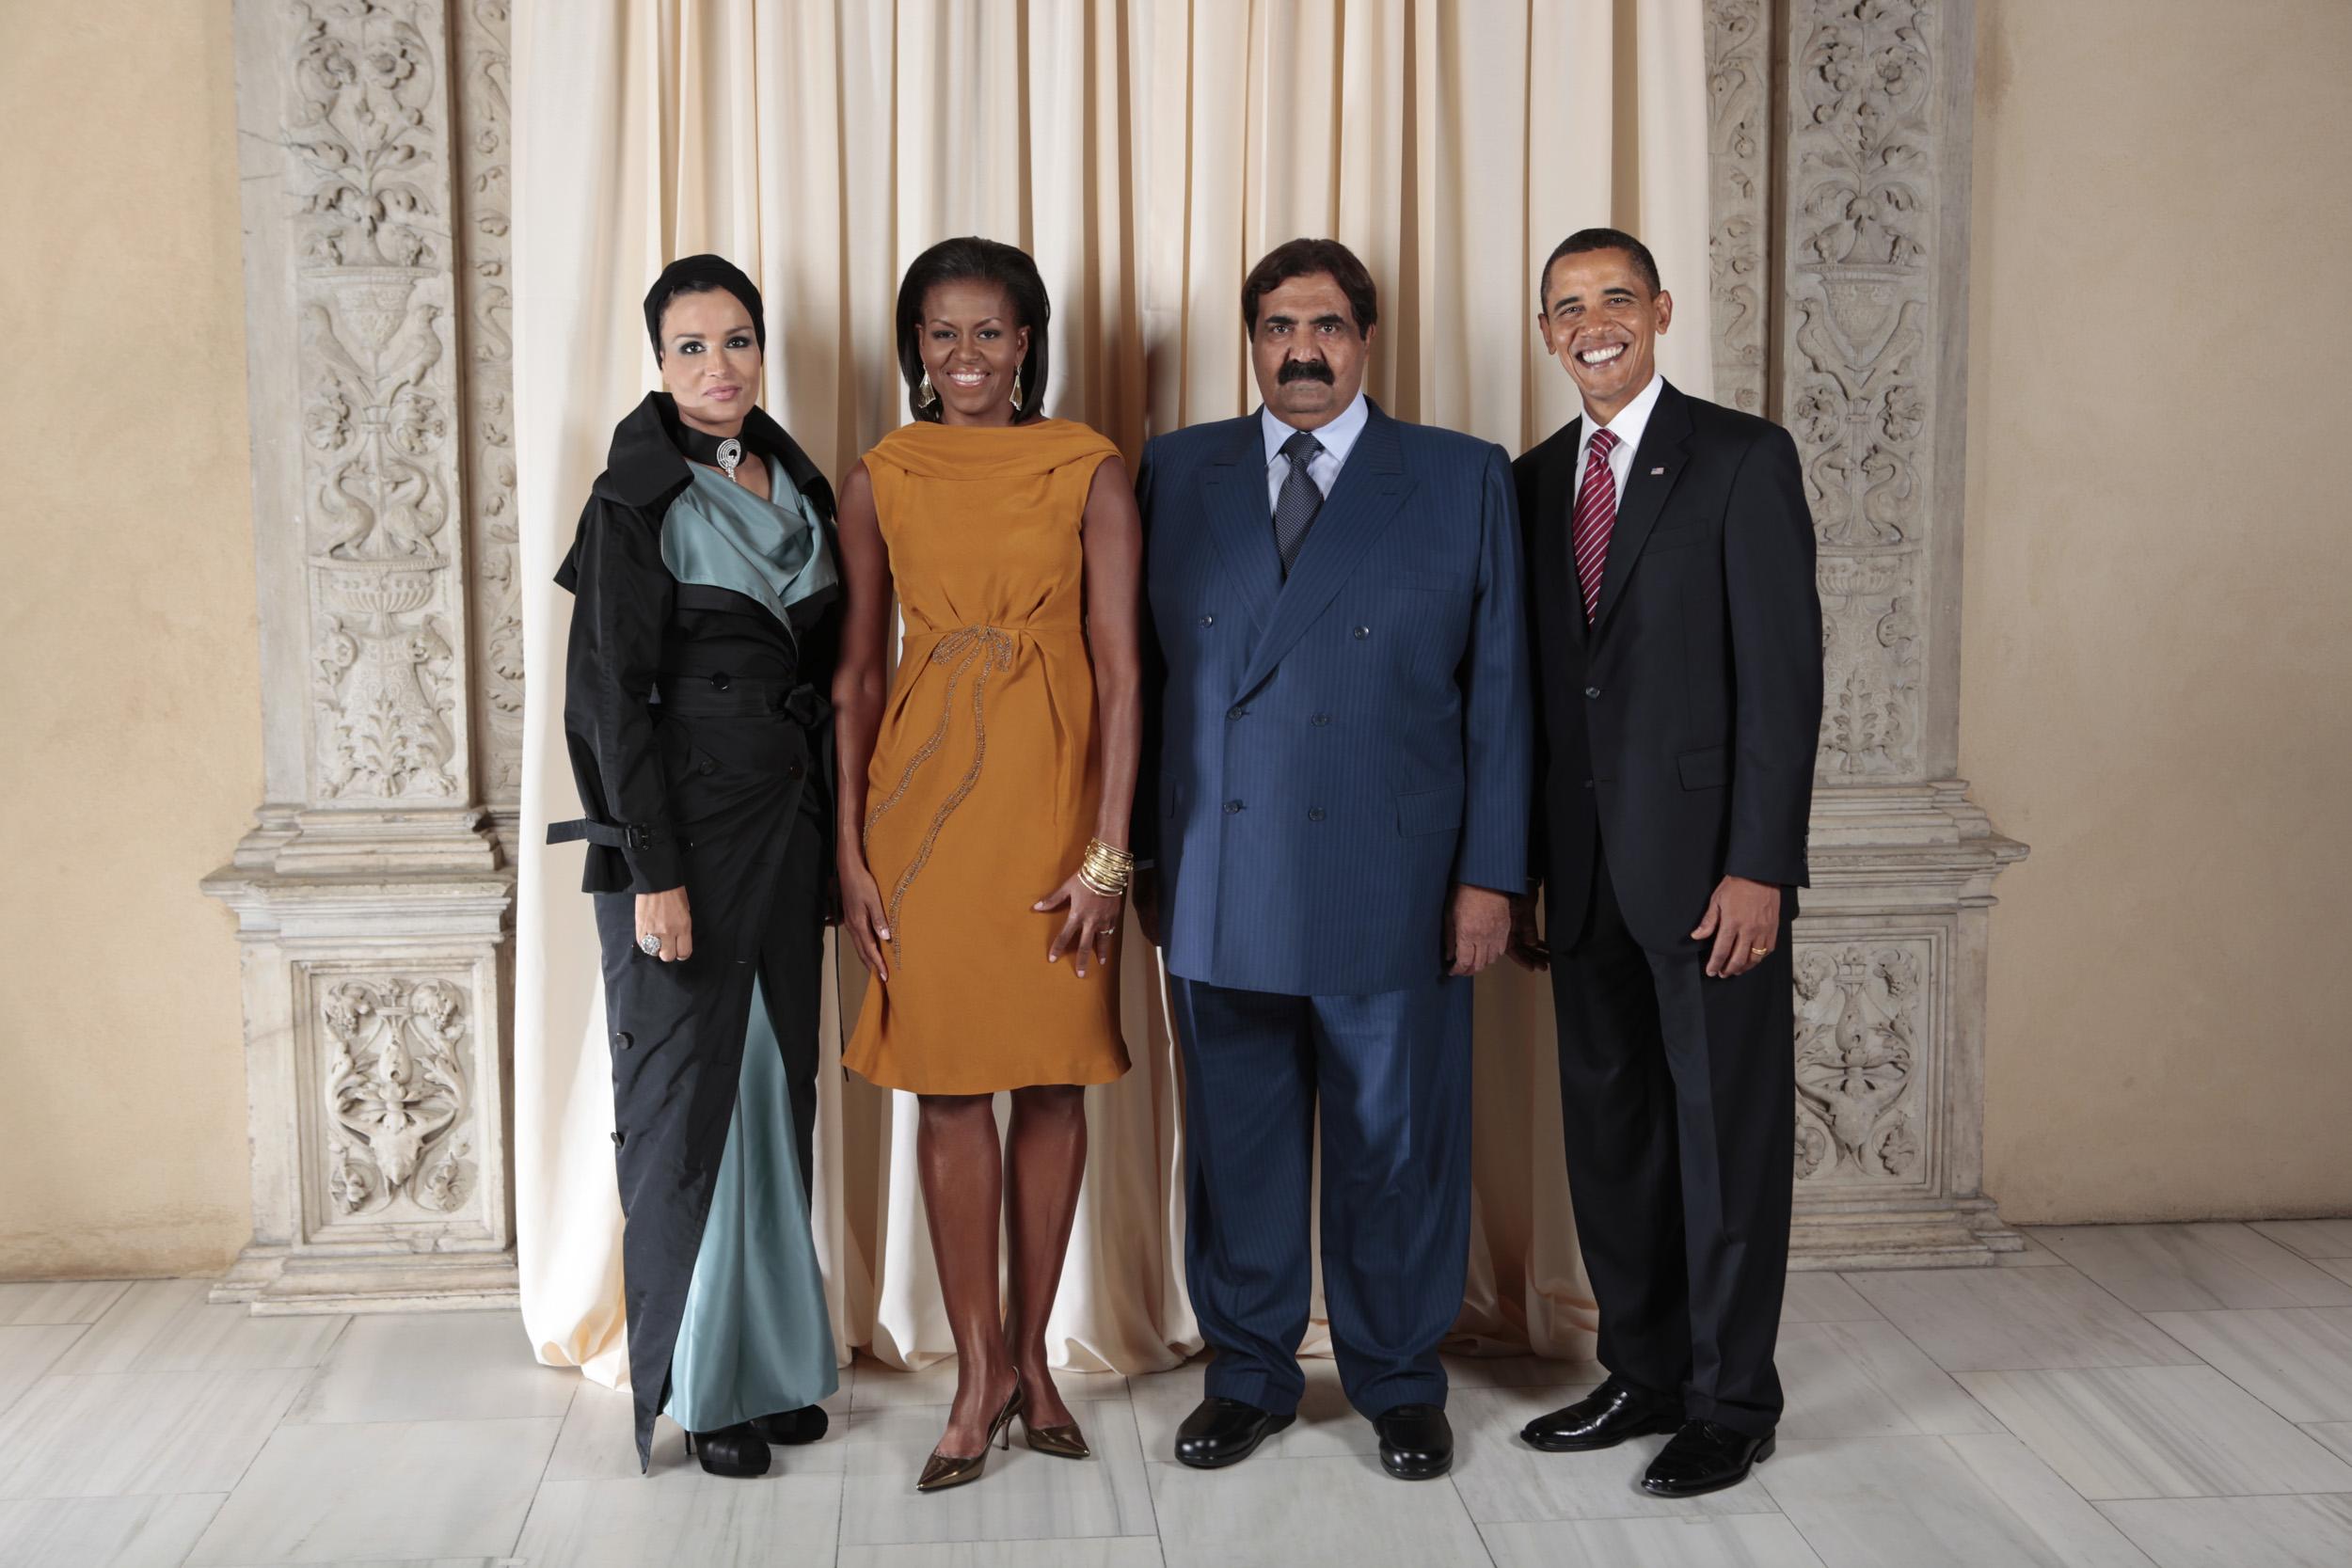 hamad_bin_khalifa_al-thani_with_obamas.jpg